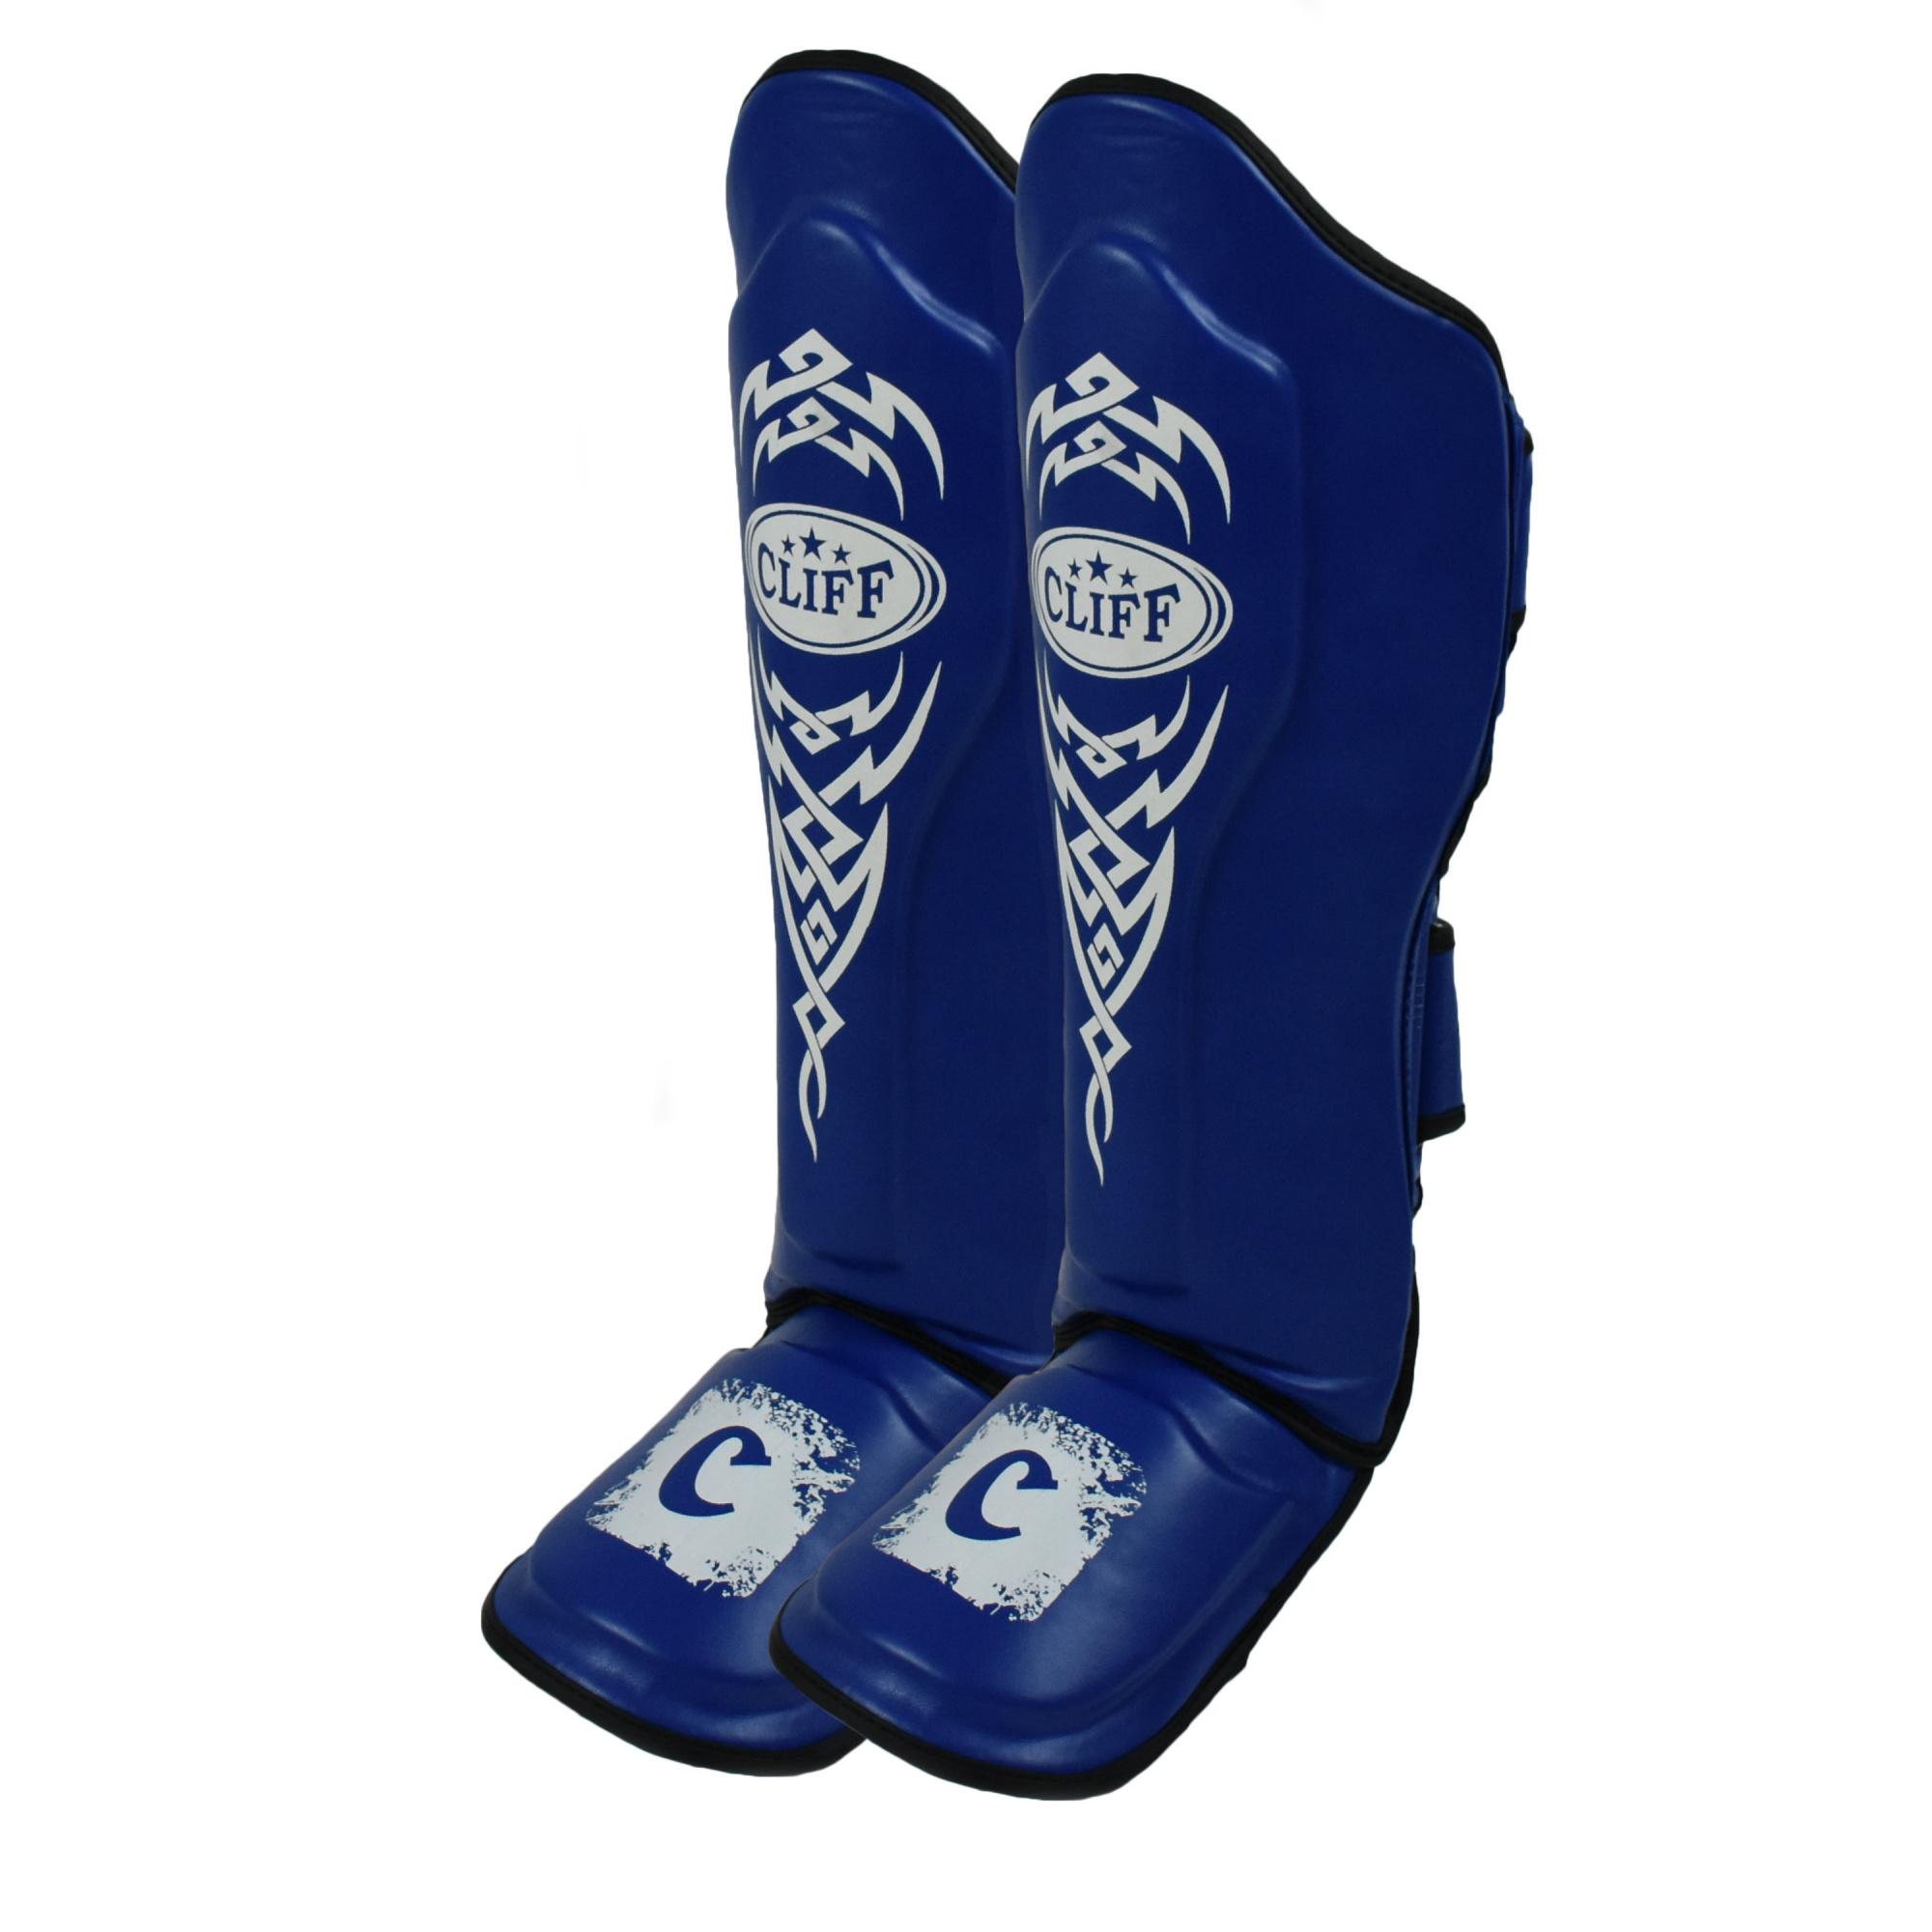 Защита ног Защита голень-стопа Клиф (DX) cfae9abedd7812225a3793937593e2ca.jpg